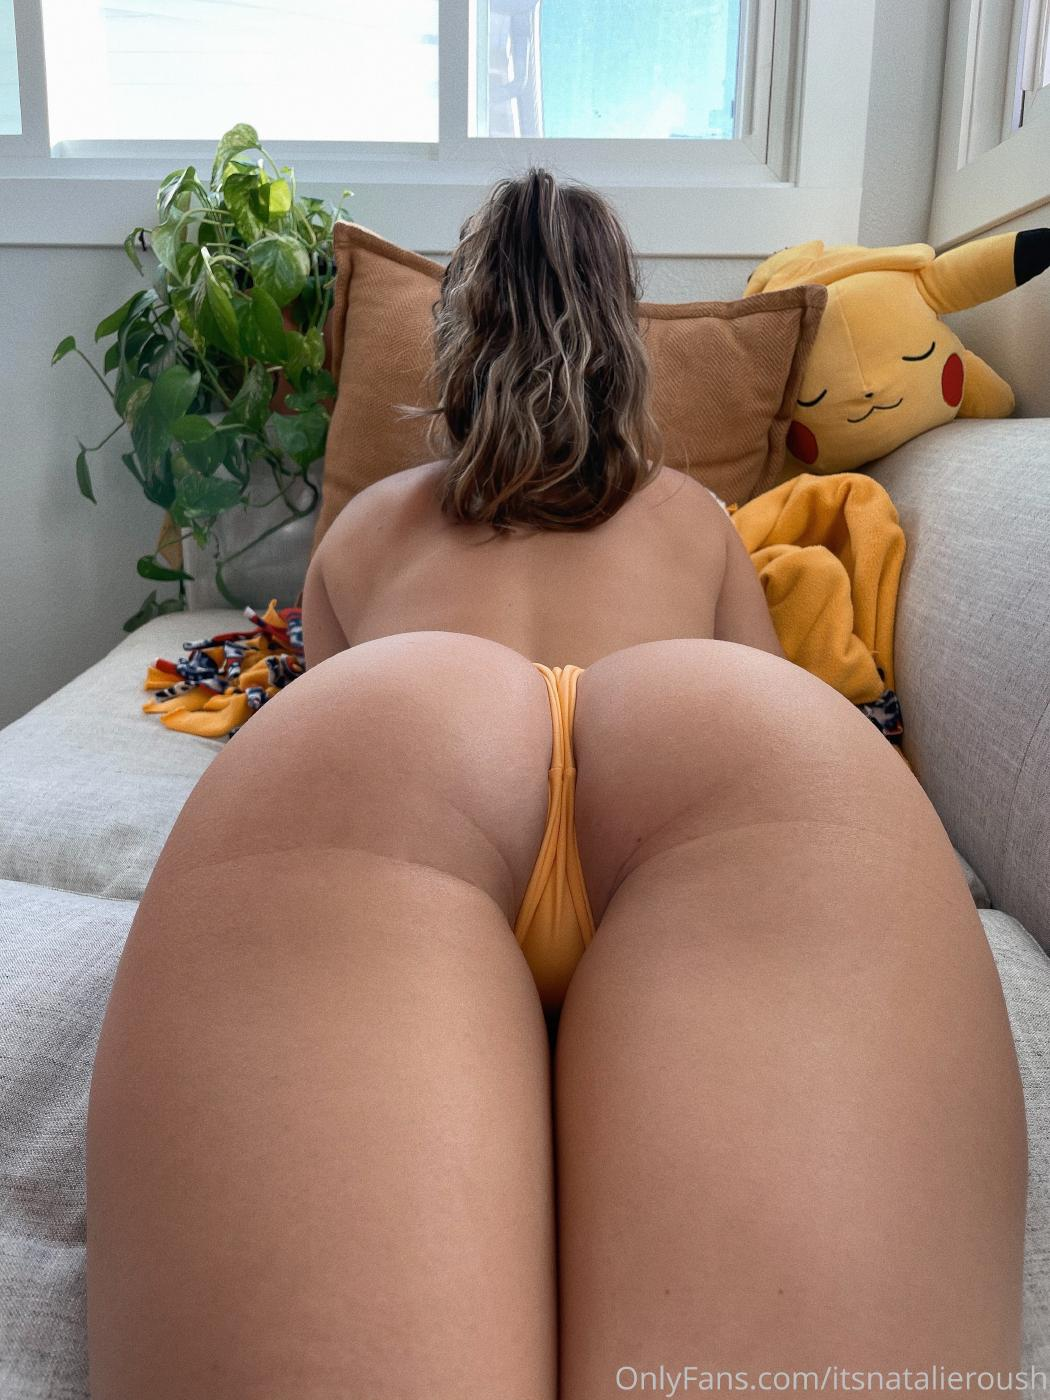 Natalie Roush Orange Thong Onlyfans Set Leaked Fuilgd